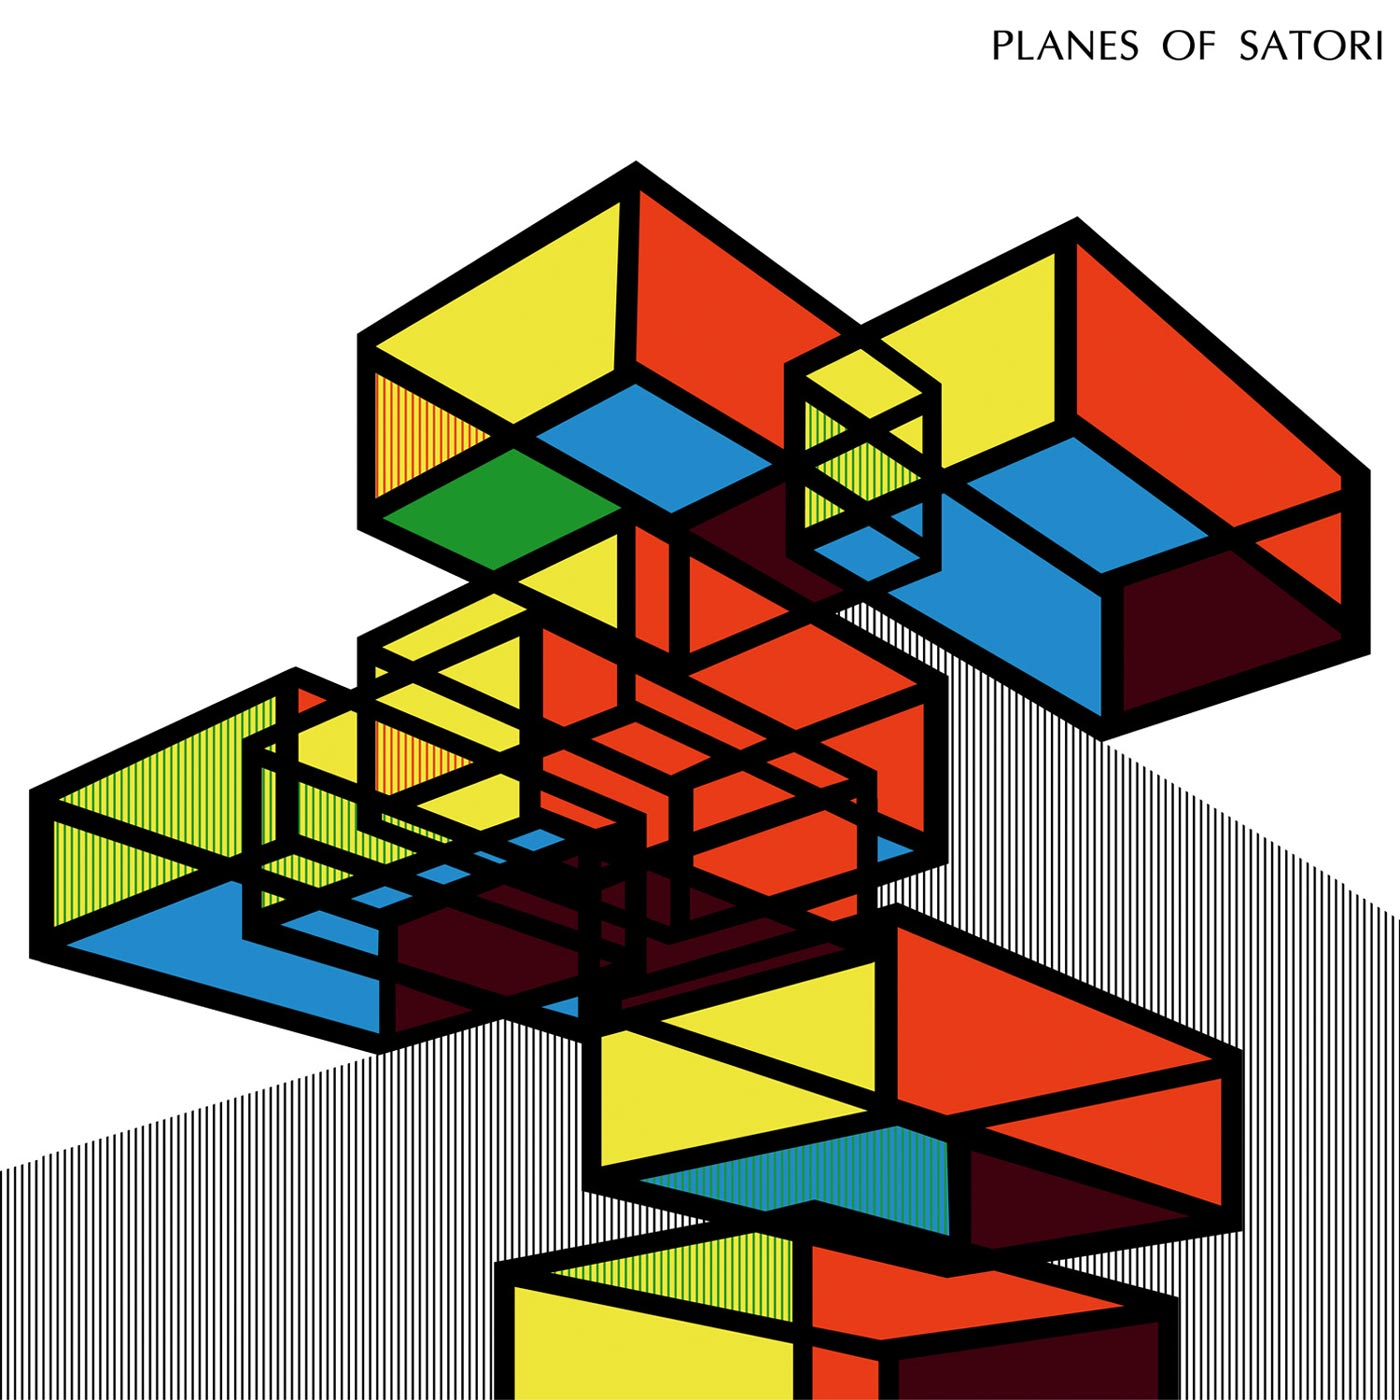 planes-of-satori-planes-of-satori